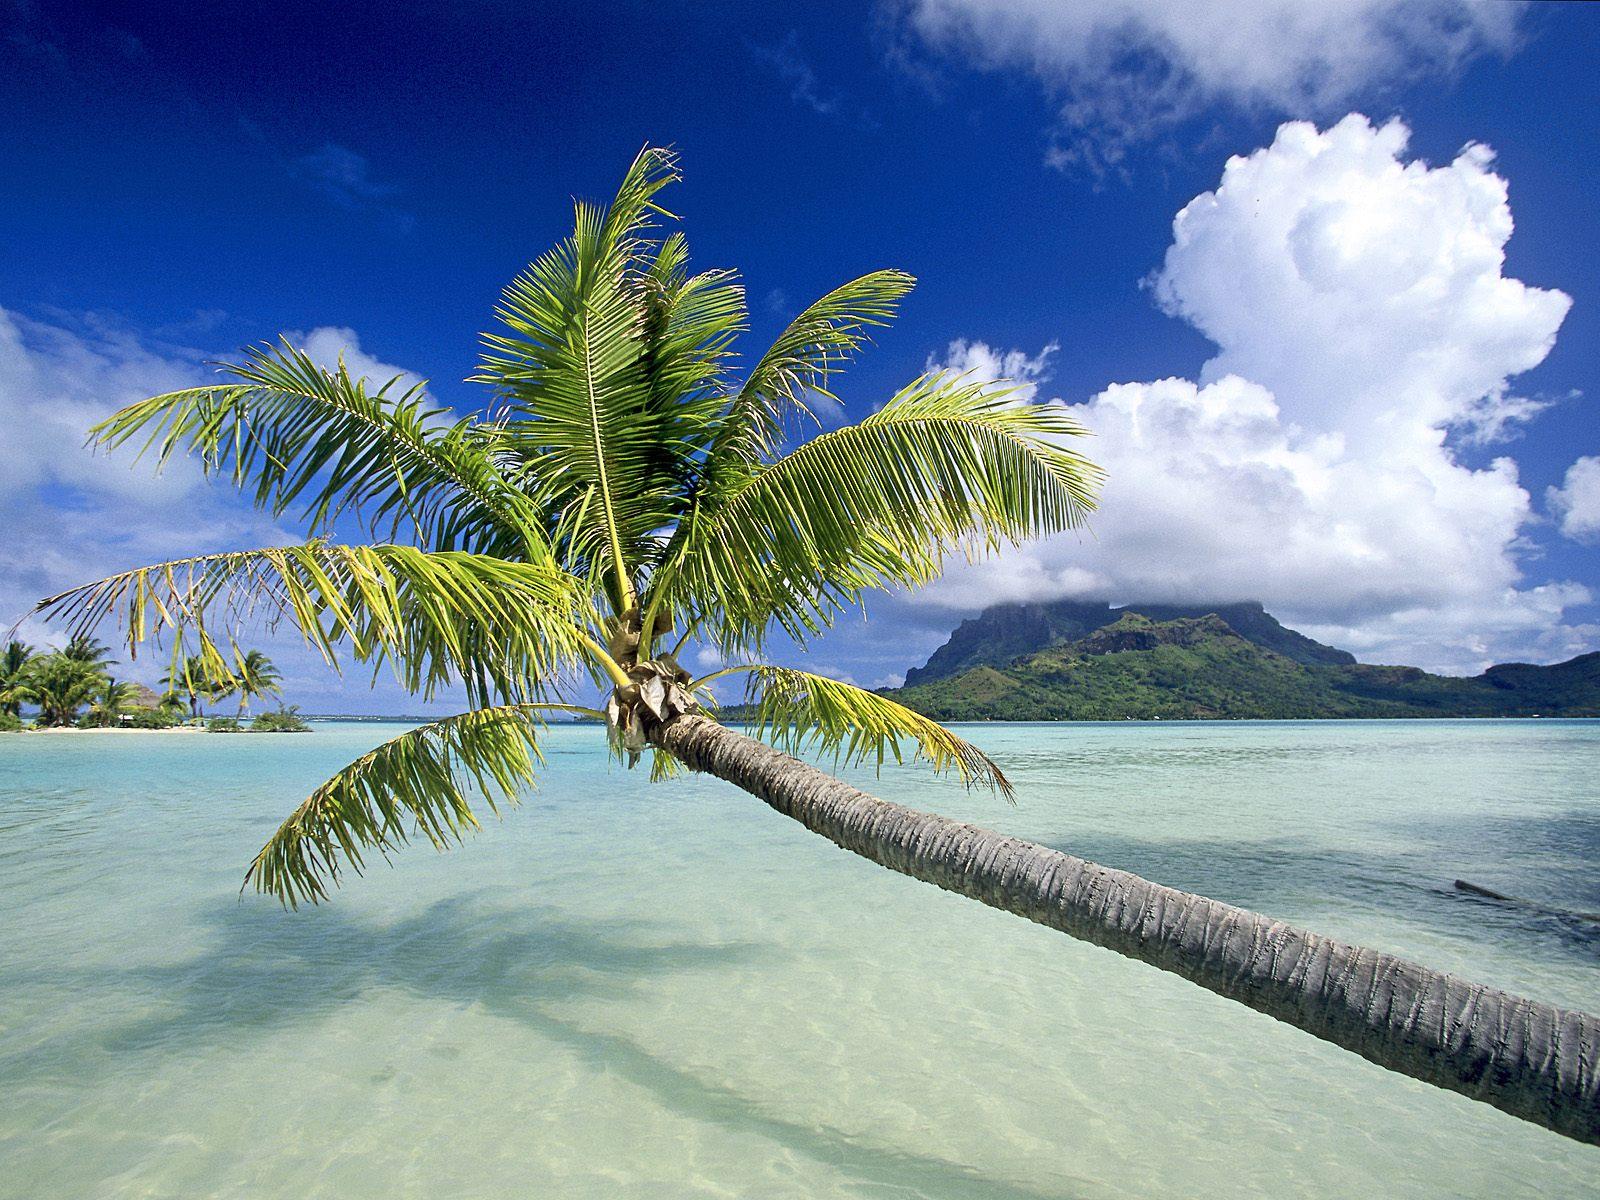 Fondos de pantalla Tropicales